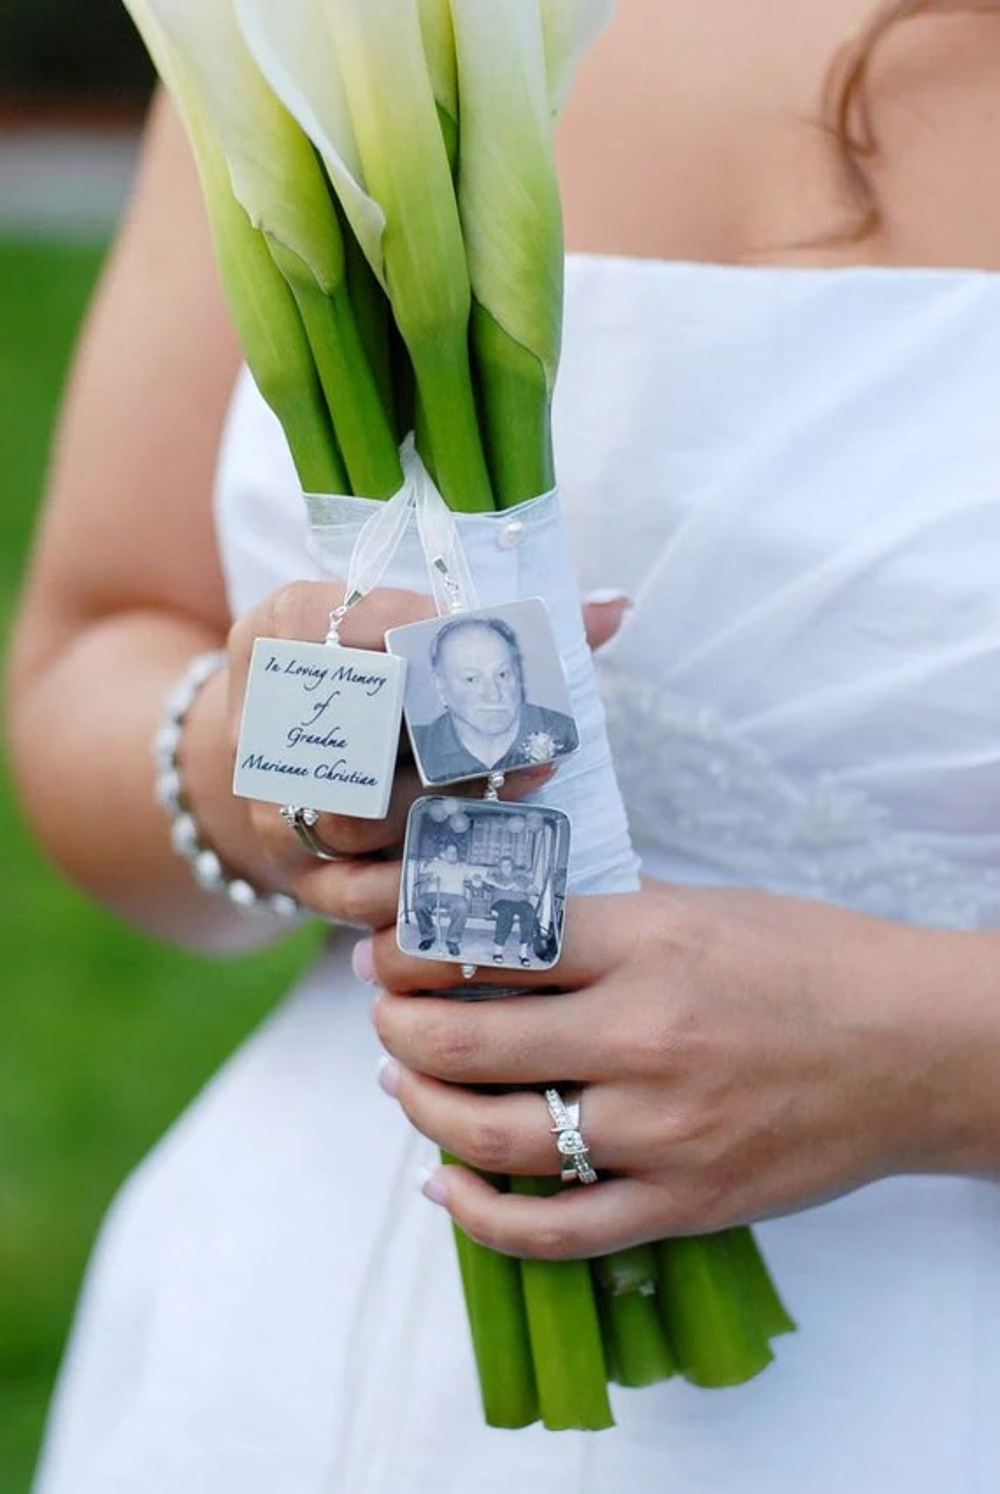 3 Lg. Bridal Bouquet Memorial Photo Charms - Handmade Photo Tile Accessory